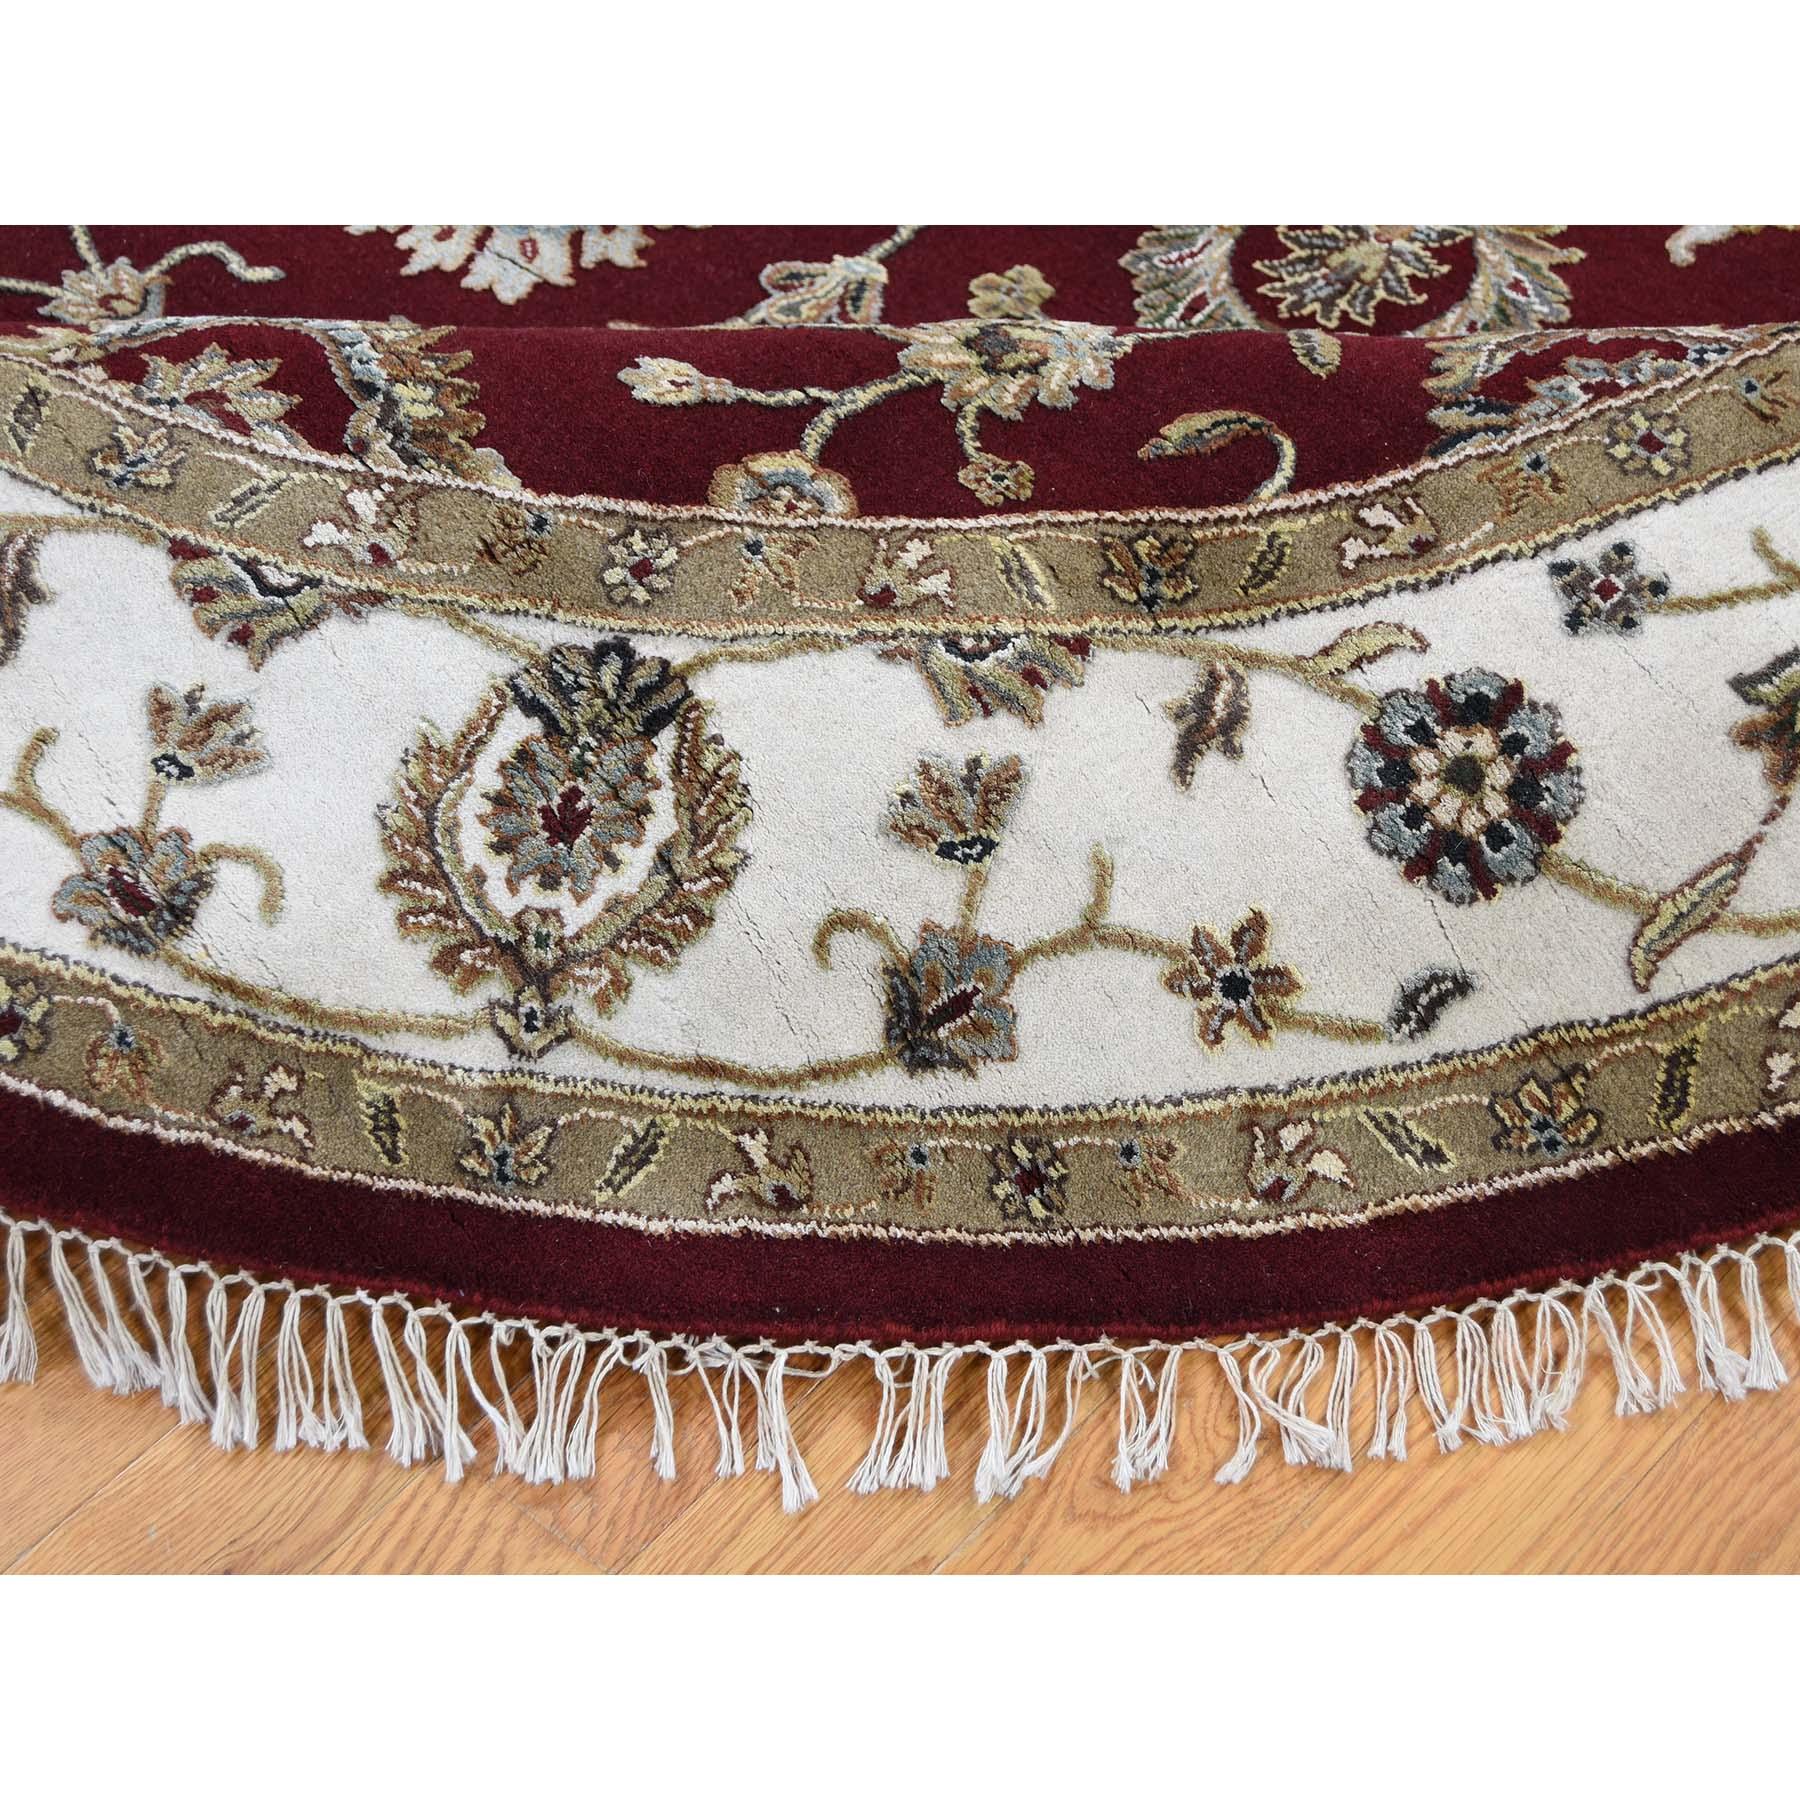 7-2 x7-2  Half Wool and Half Silk Burgundy Rajasthan Round Hand-Knotted Oriental Rug